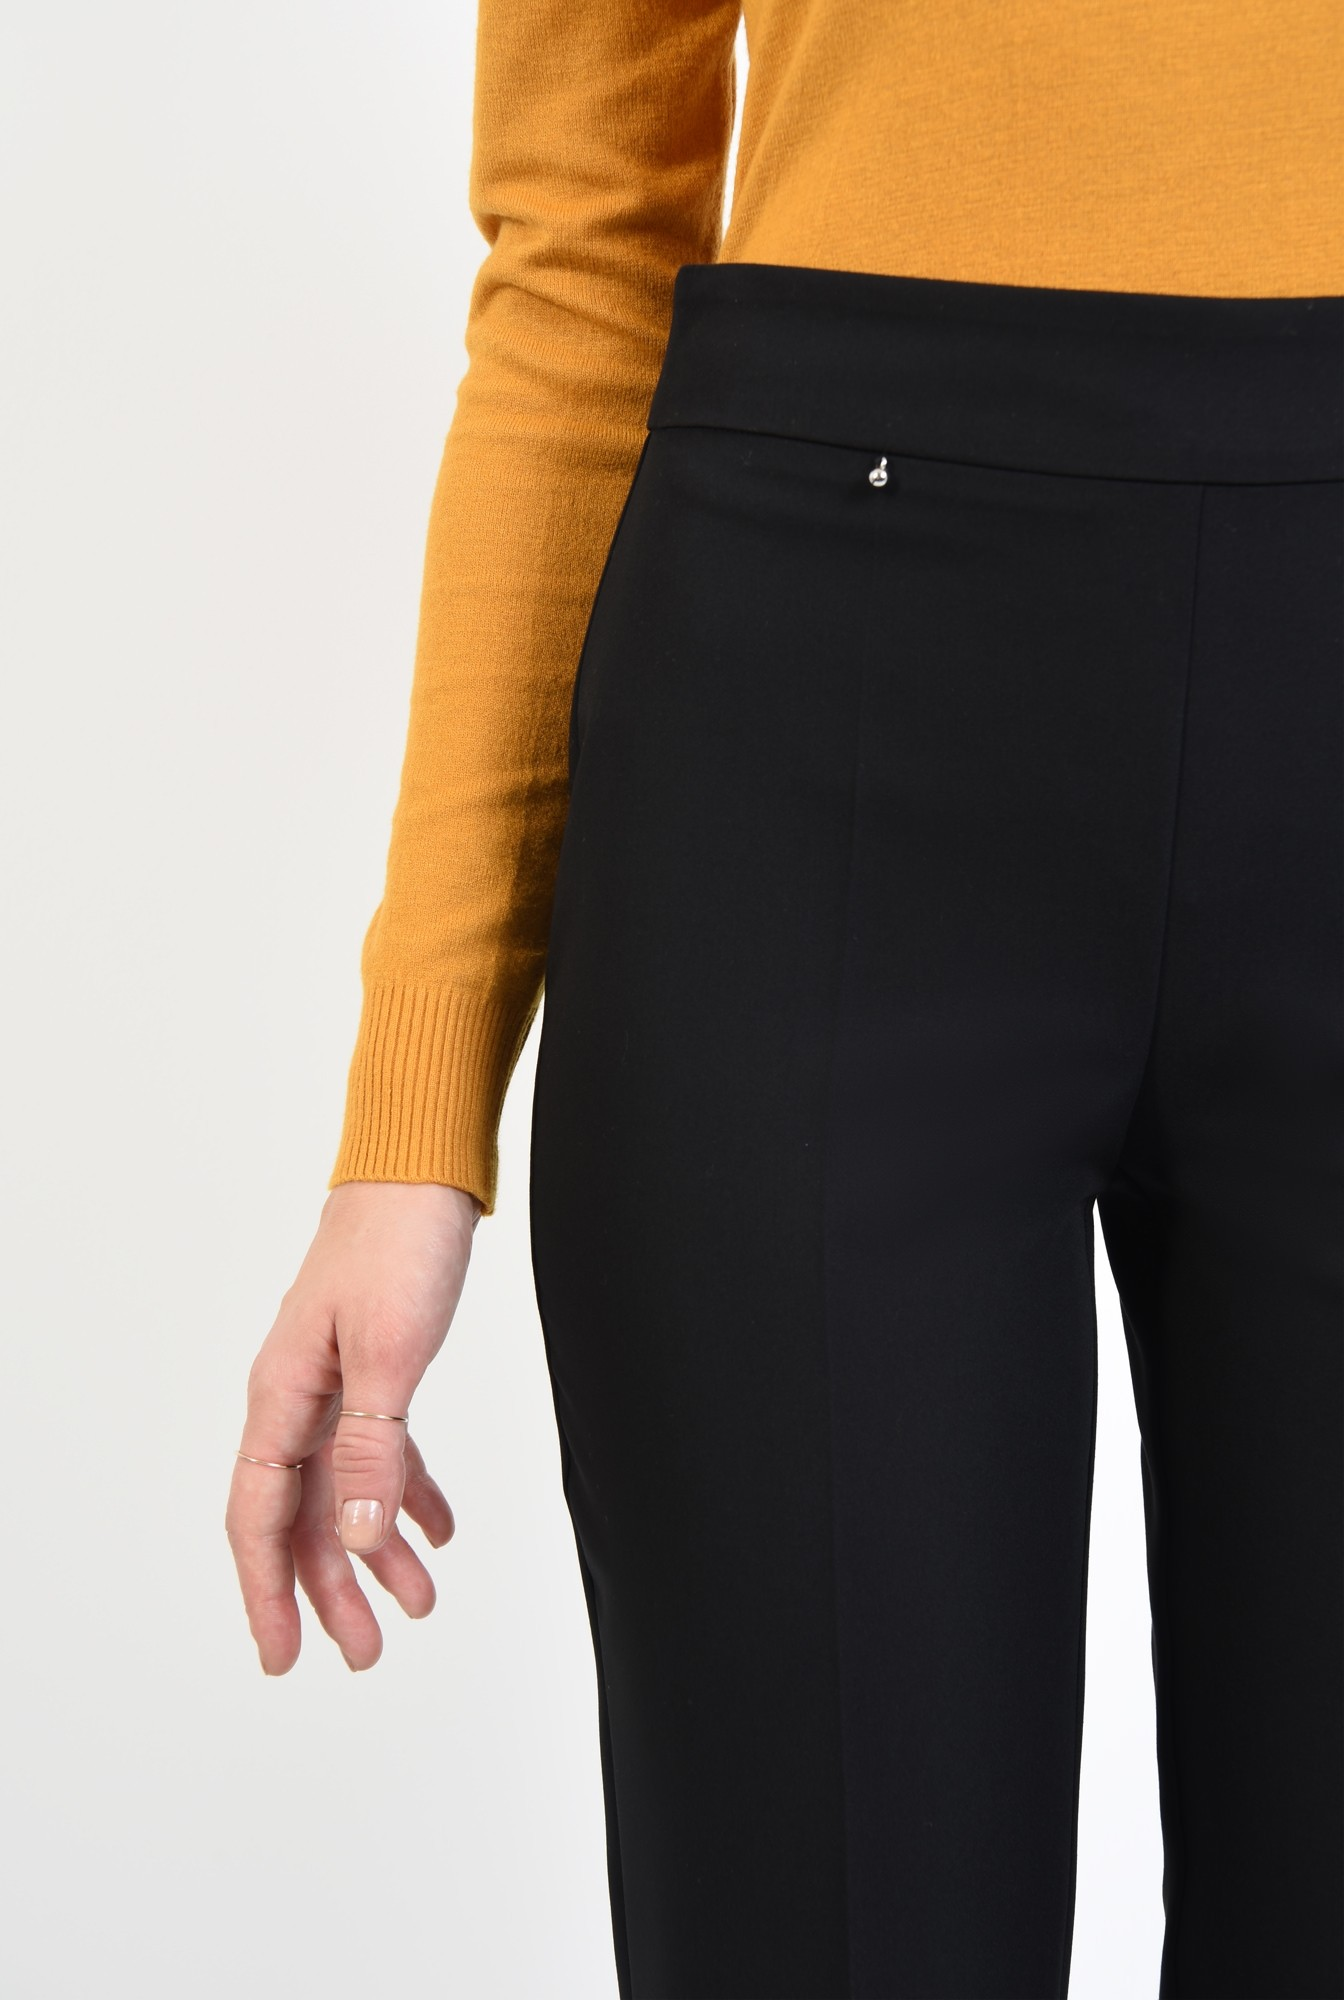 2 - pantaloni de zi, croi conic, buzunare in cusatura, talie inalta